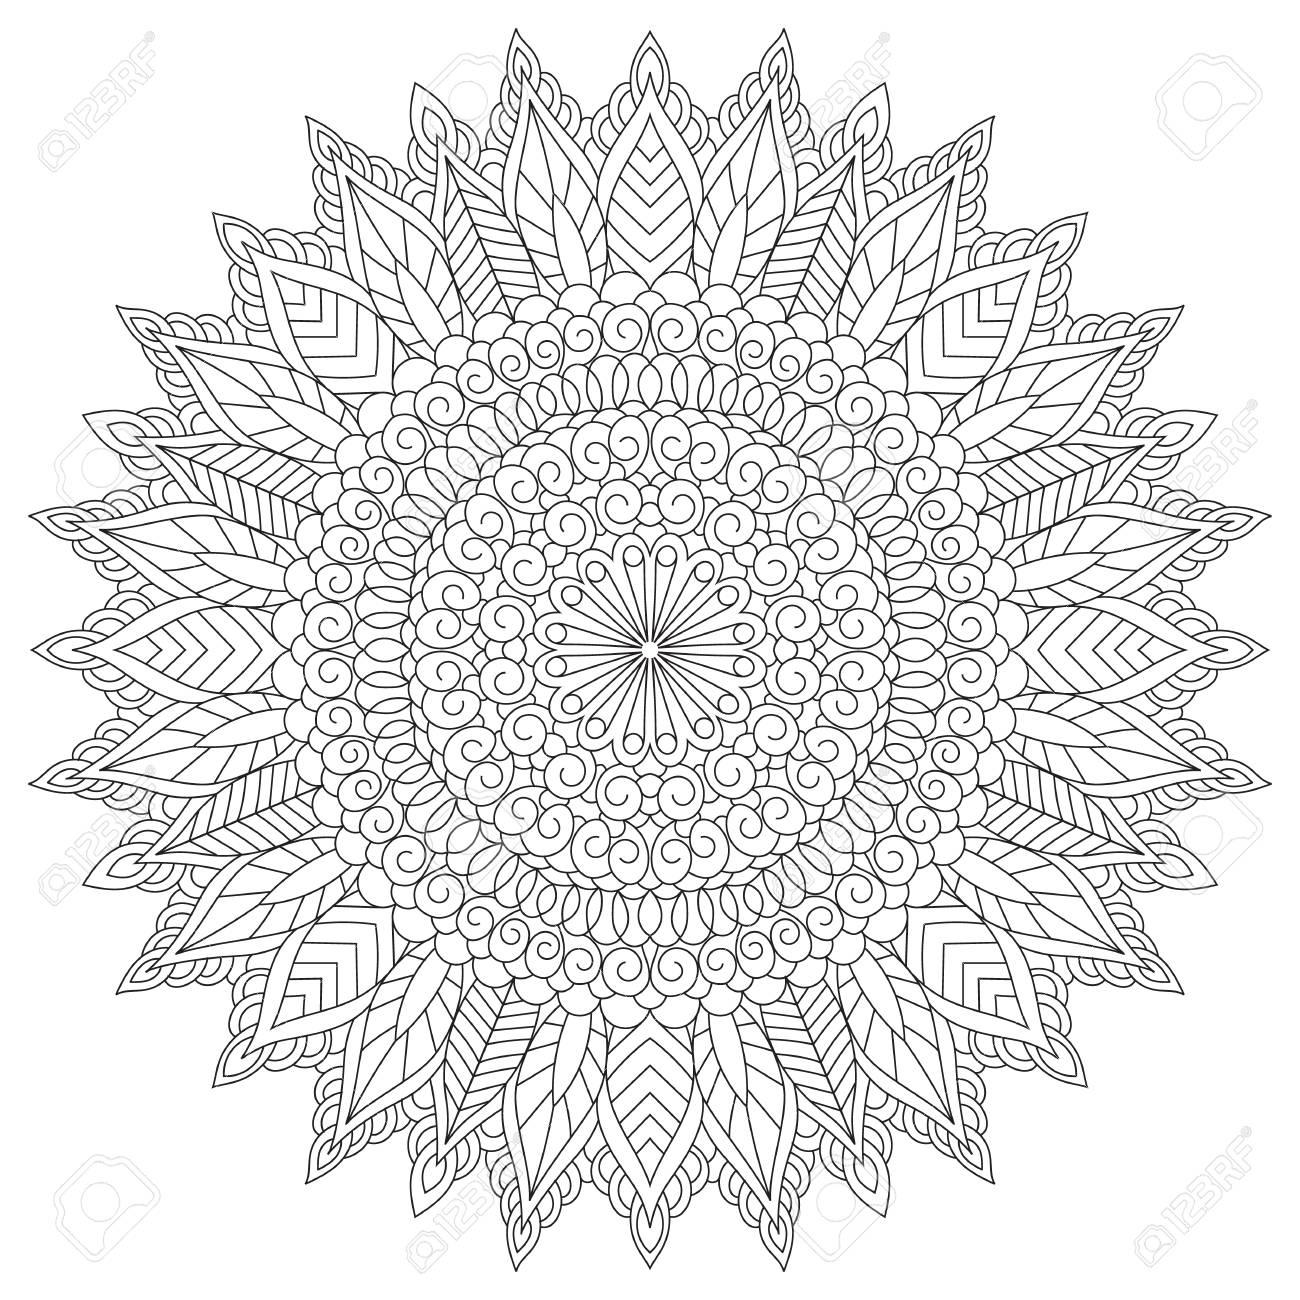 Mandala coloring book page design. Flower circular anti stress..